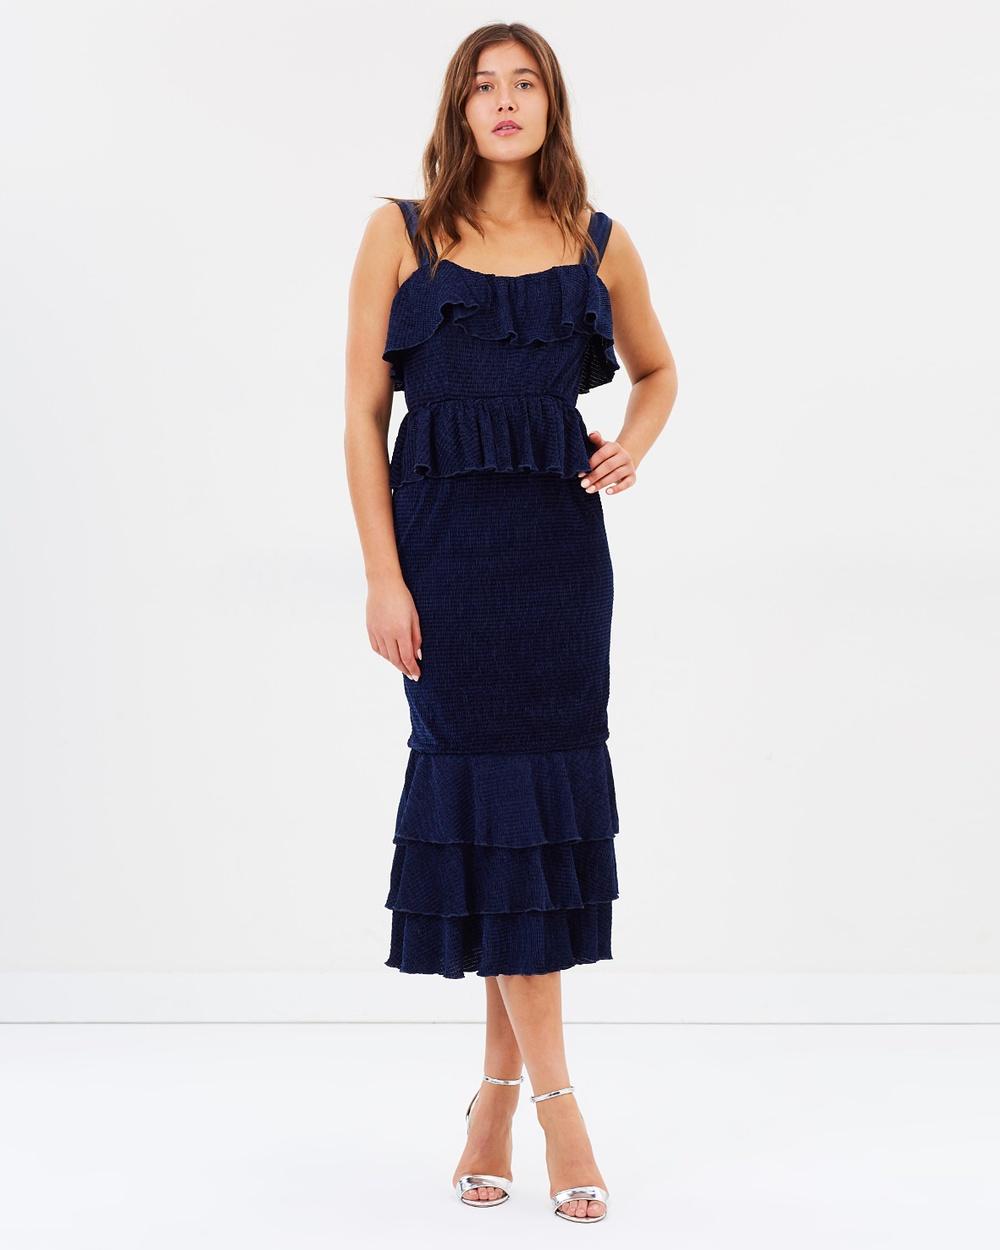 Atoir Trust Fund Dress Dresses Indigo Trust Fund Dress